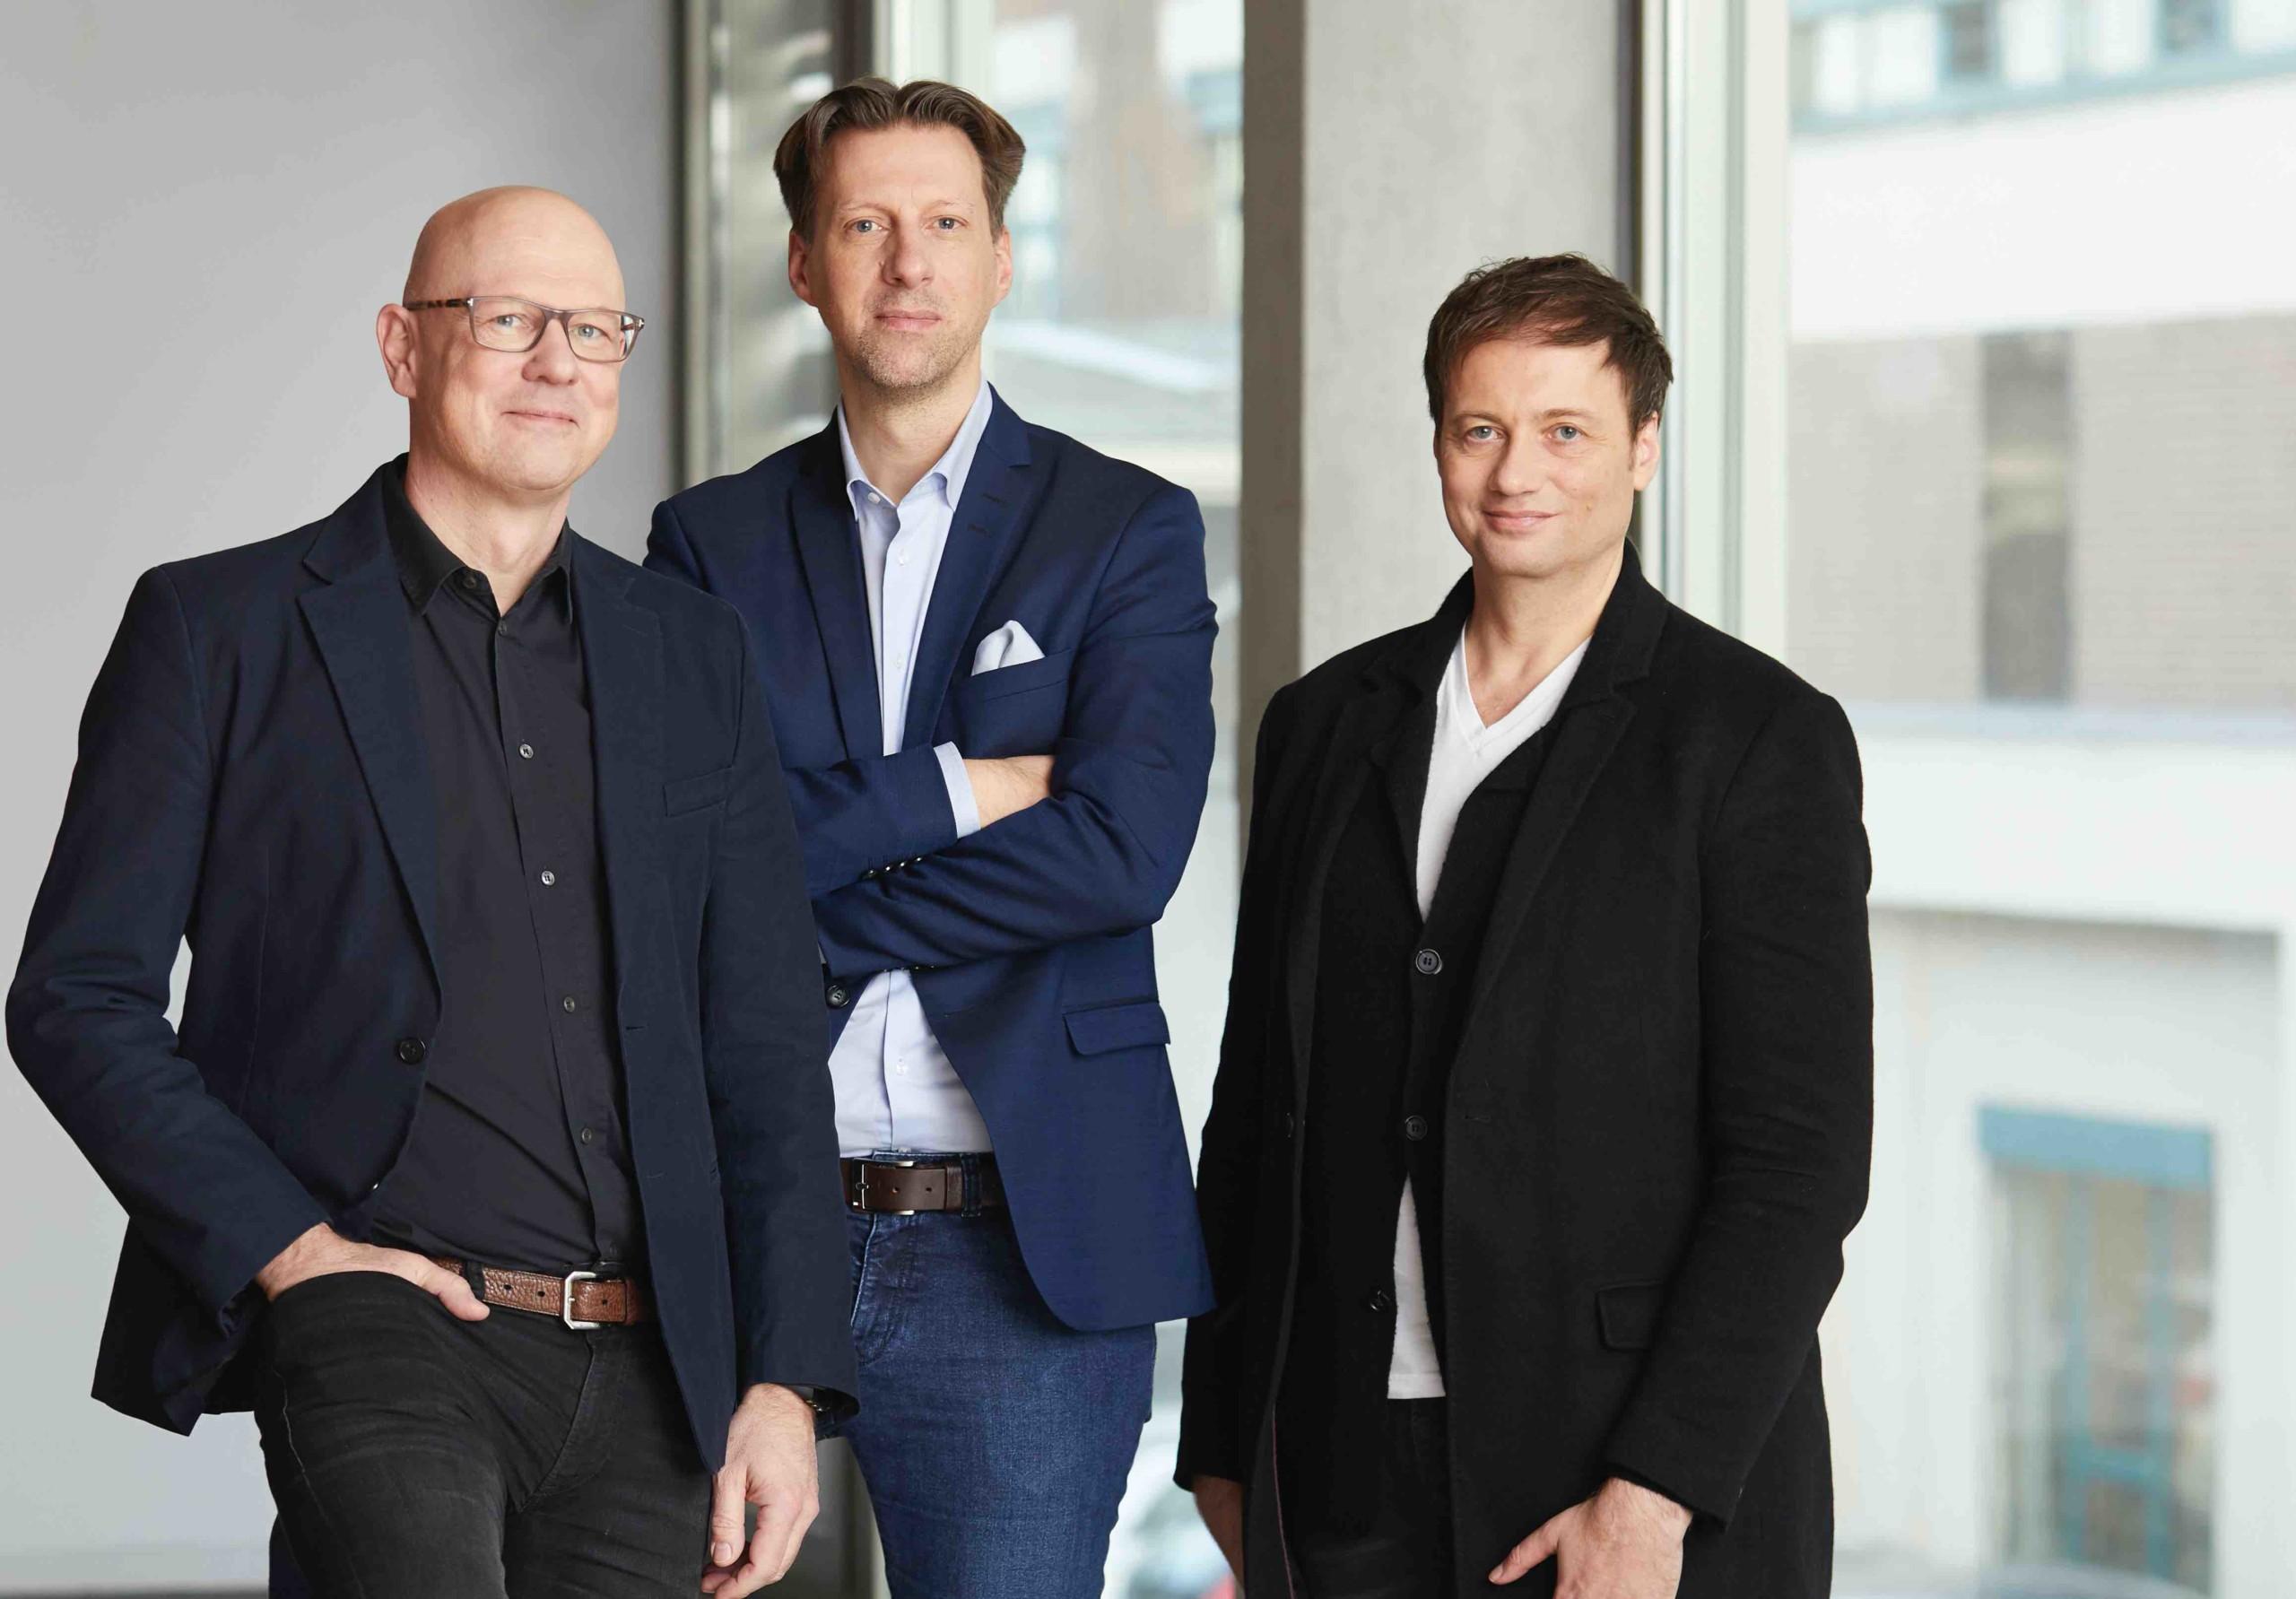 Rüdiger Maeßen joins Uniplan Germany as Managing Director